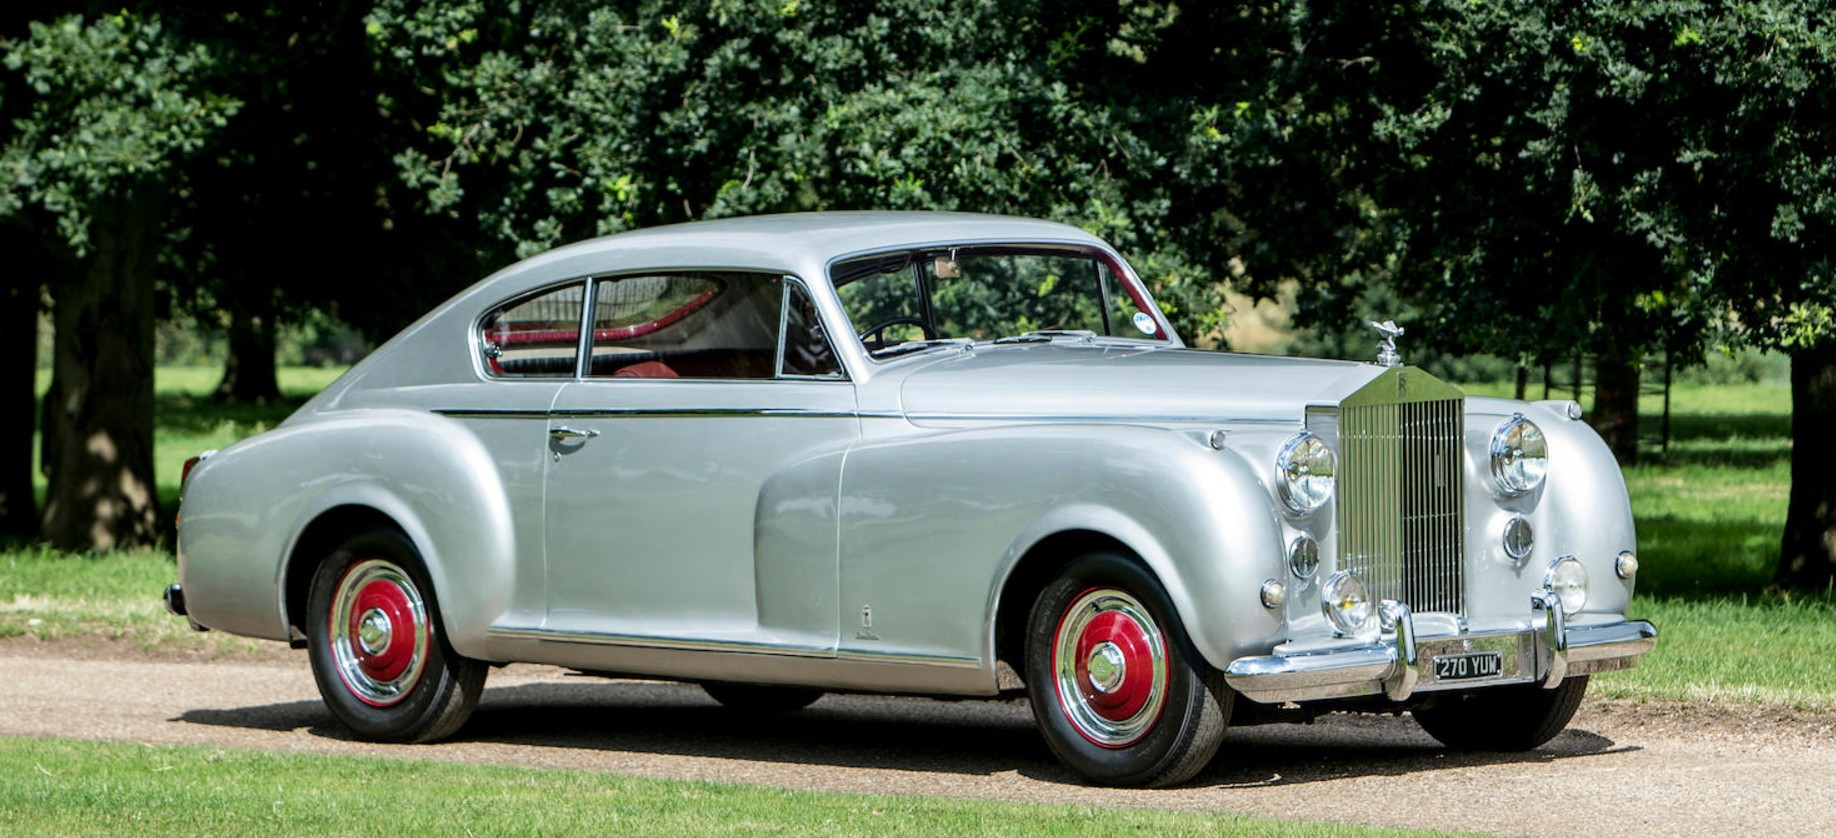 1951 rolls royce silver dawn fastback coupe by pininfarina